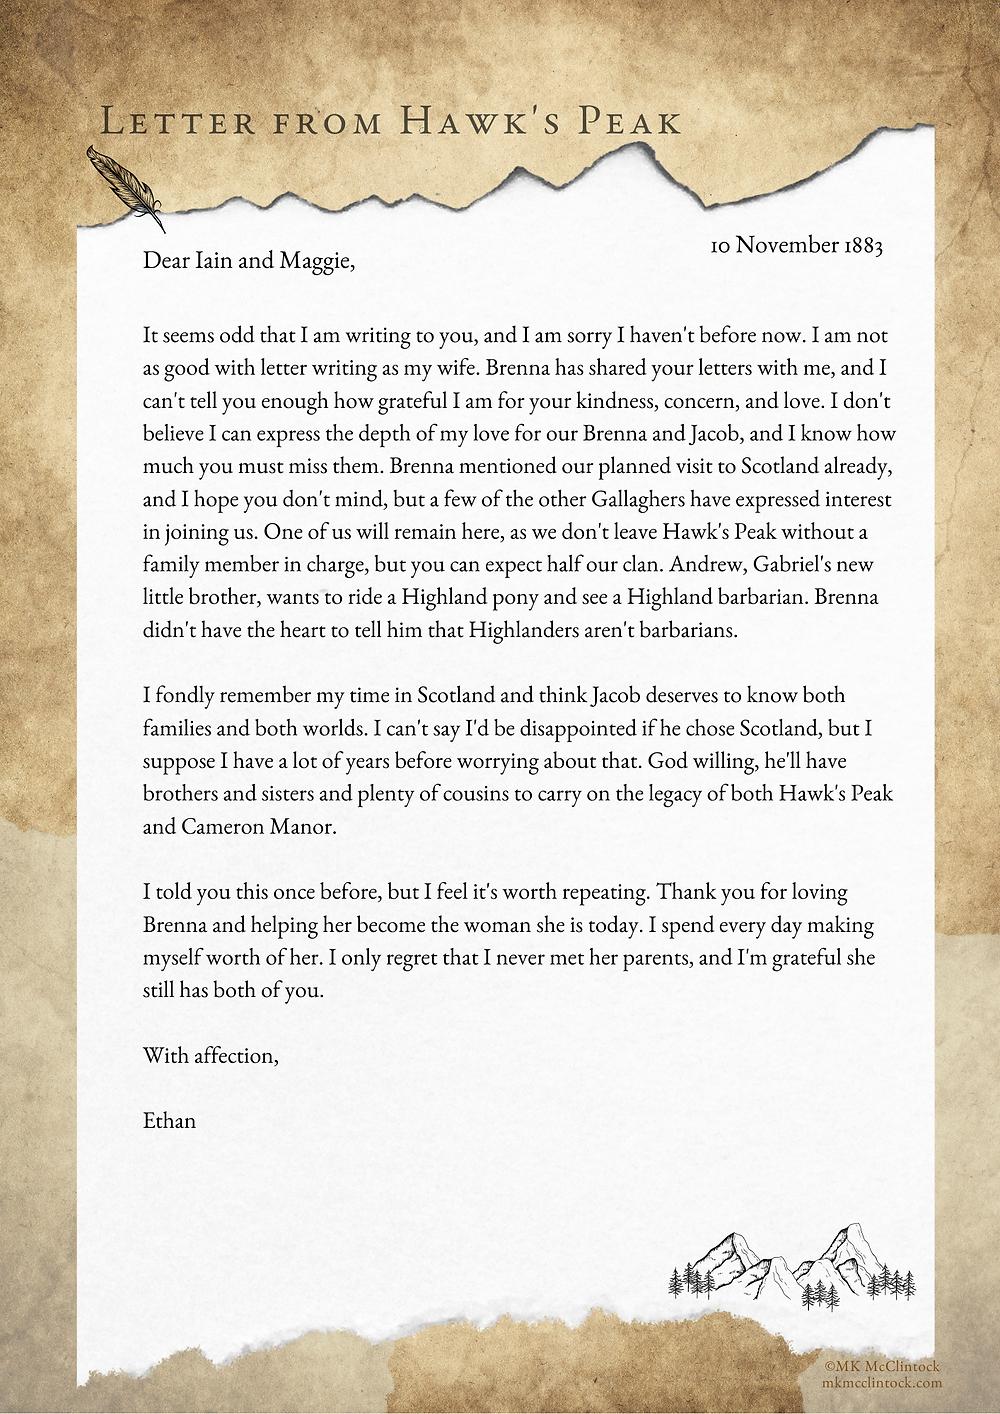 Letter From Hawk's Peak:  - November 10, 1883_MK McClintock_Montana Gallagher series